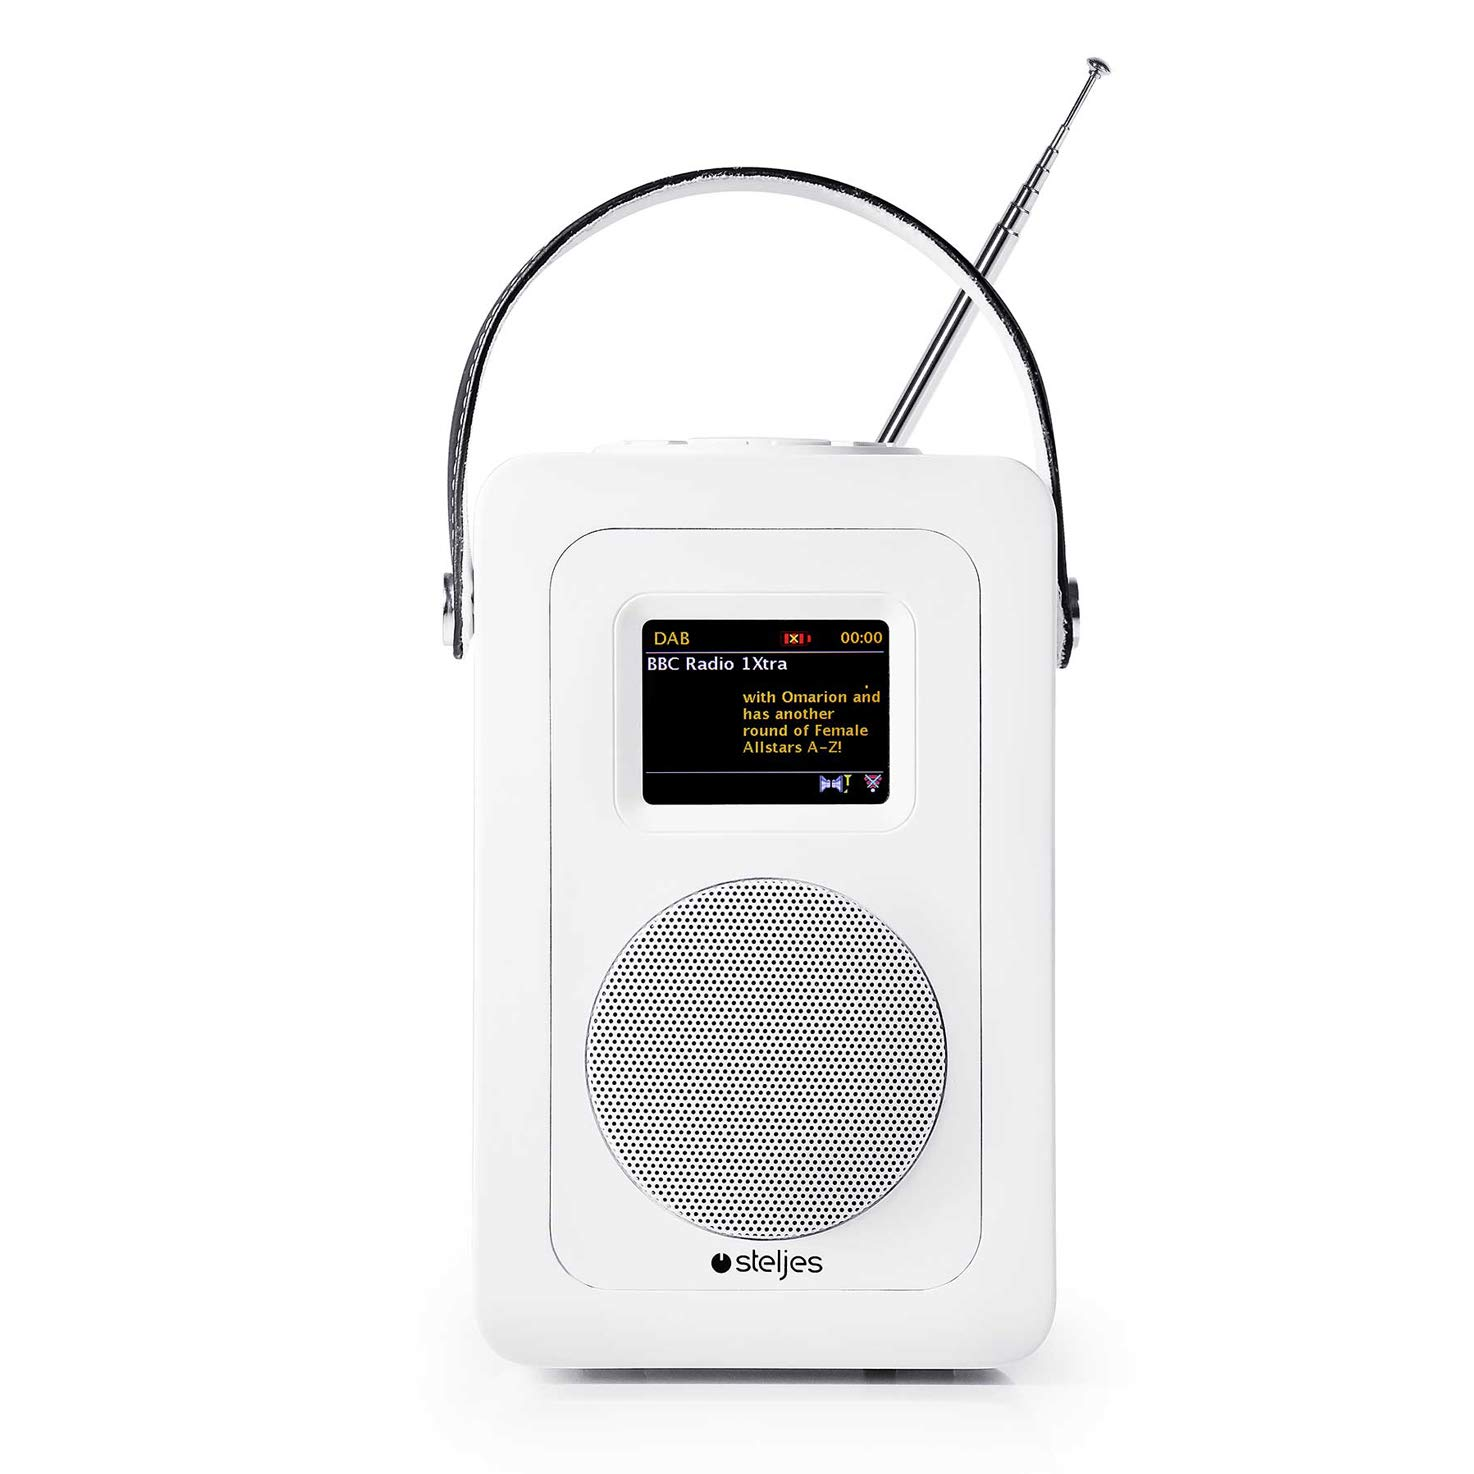 Steljes Audio SA60 Radio Internet Altavoz Bluetooth, Radio Dab con WiFi Portatiles Dab + Dab + Radio con Transmisión FM, Internet Radio con WiFi para Teléfono Móvil de iOS y Android